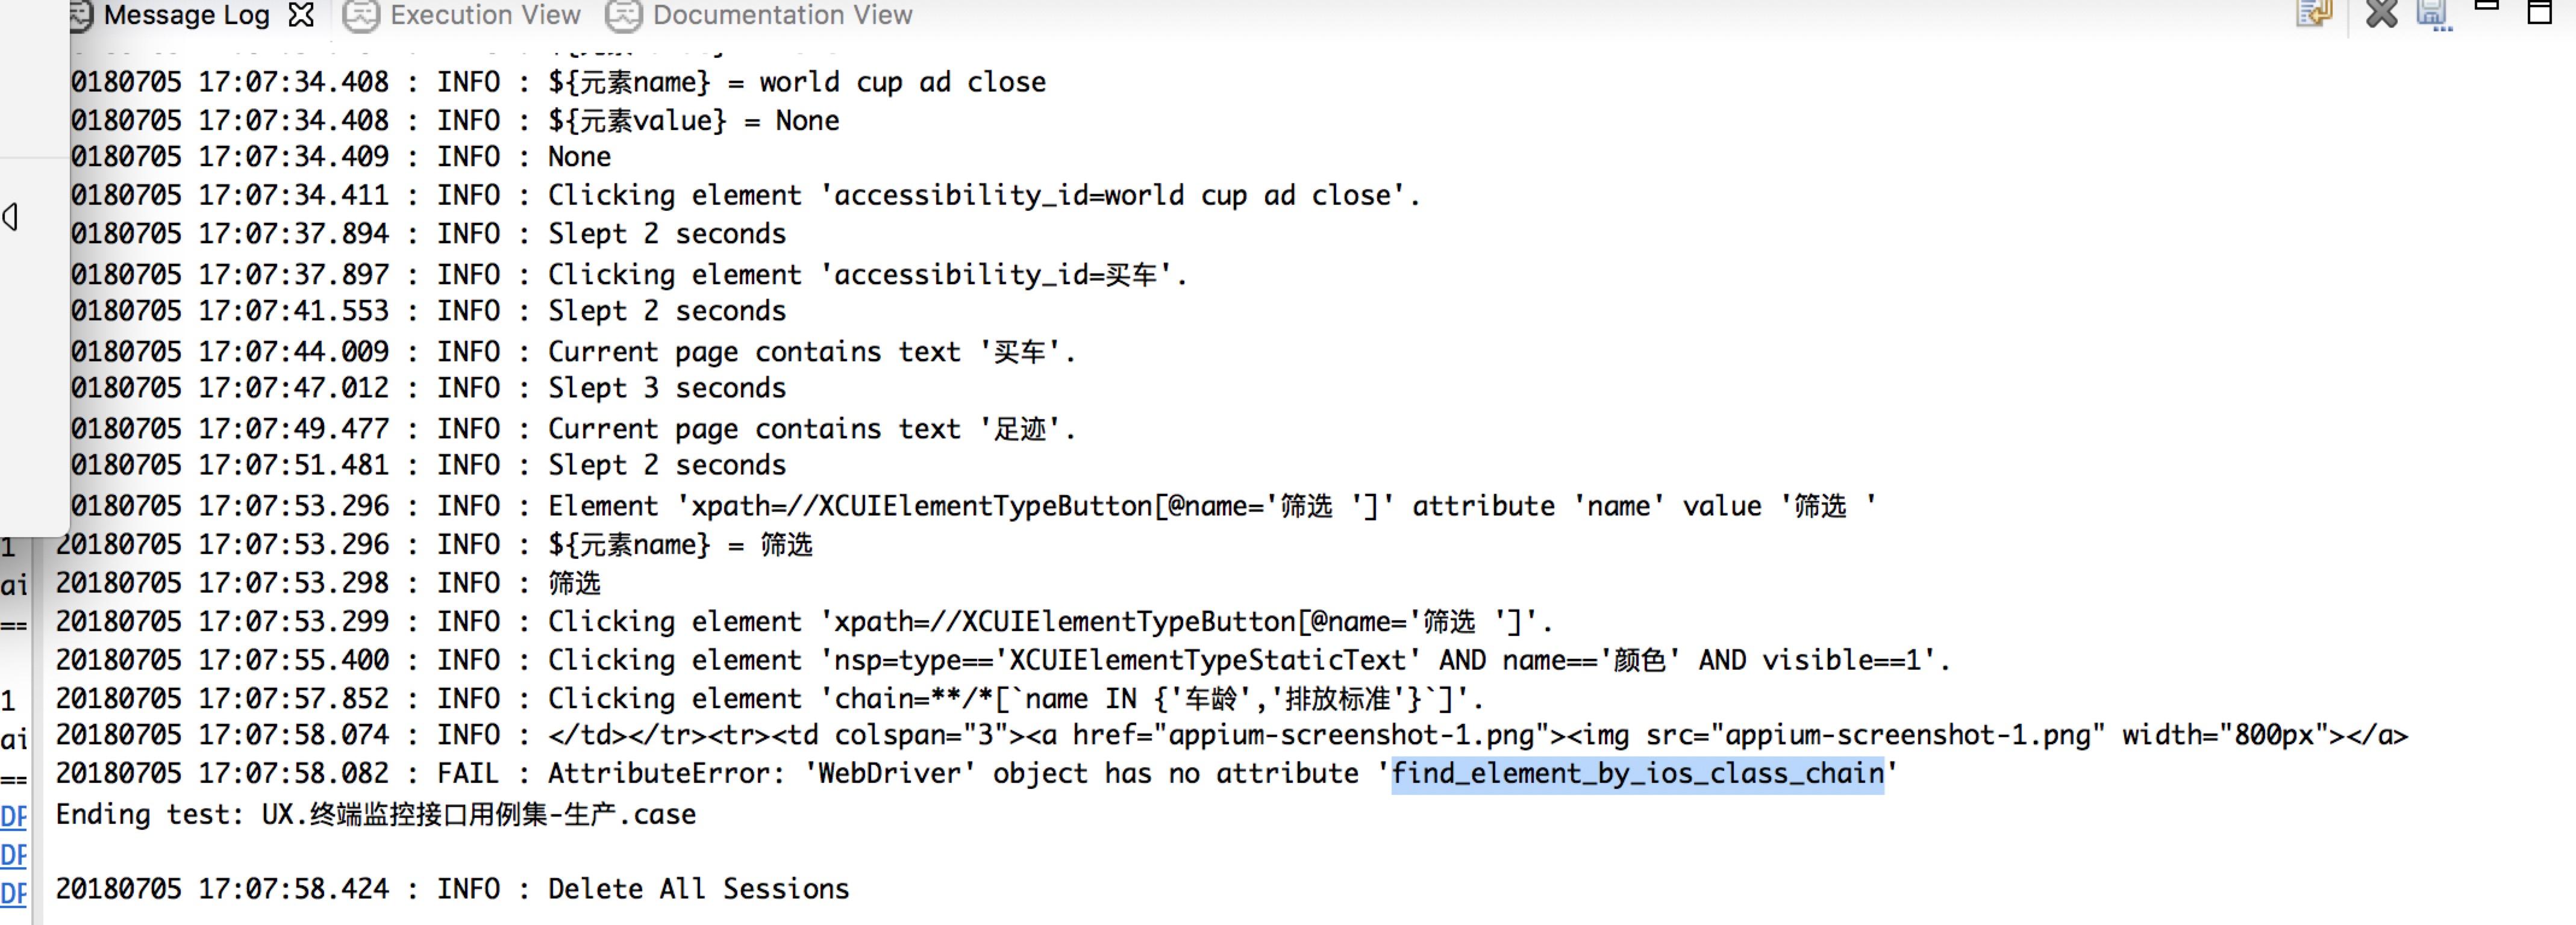 Appiumlibrary Robot Framework Documentation